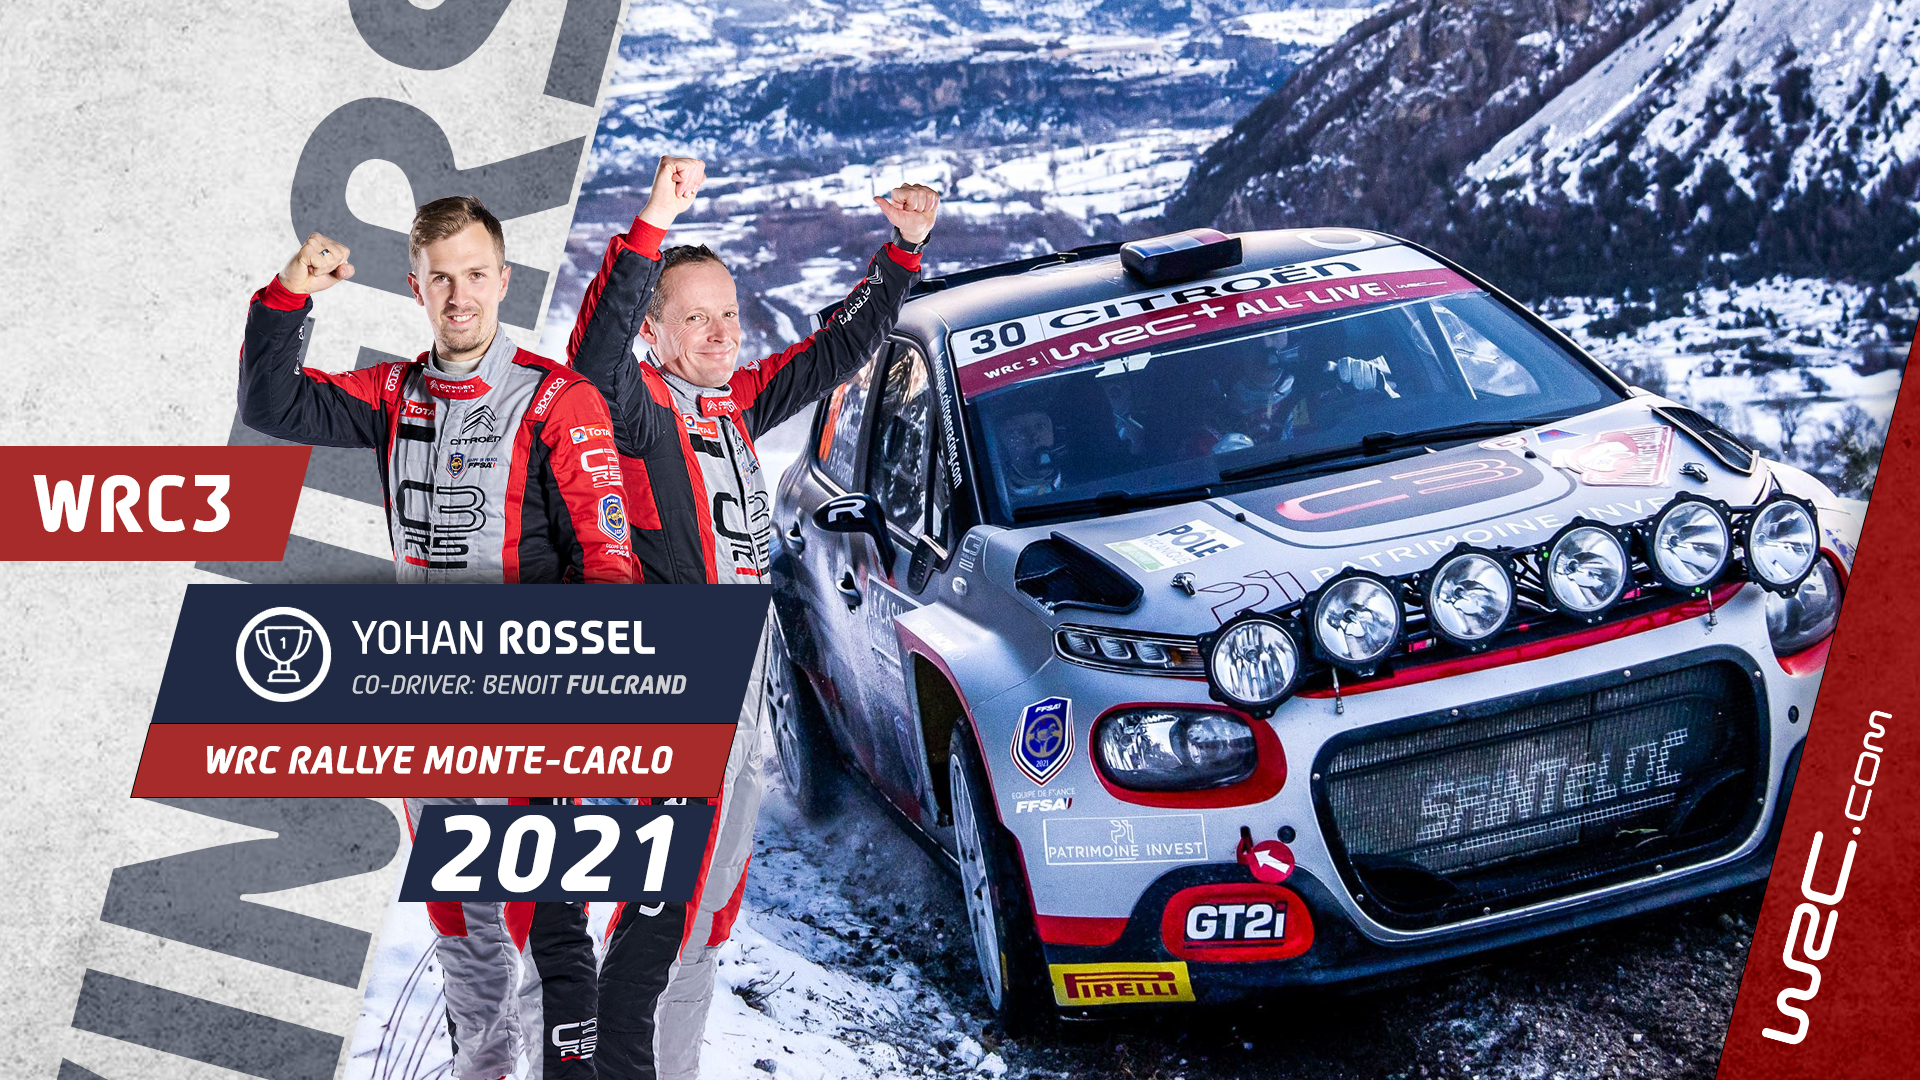 WRC: 89º Rallye Automobile de Monte-Carlo [18-24 Enero] - Página 15 230121_winner-WRC3-Rossel-16_9